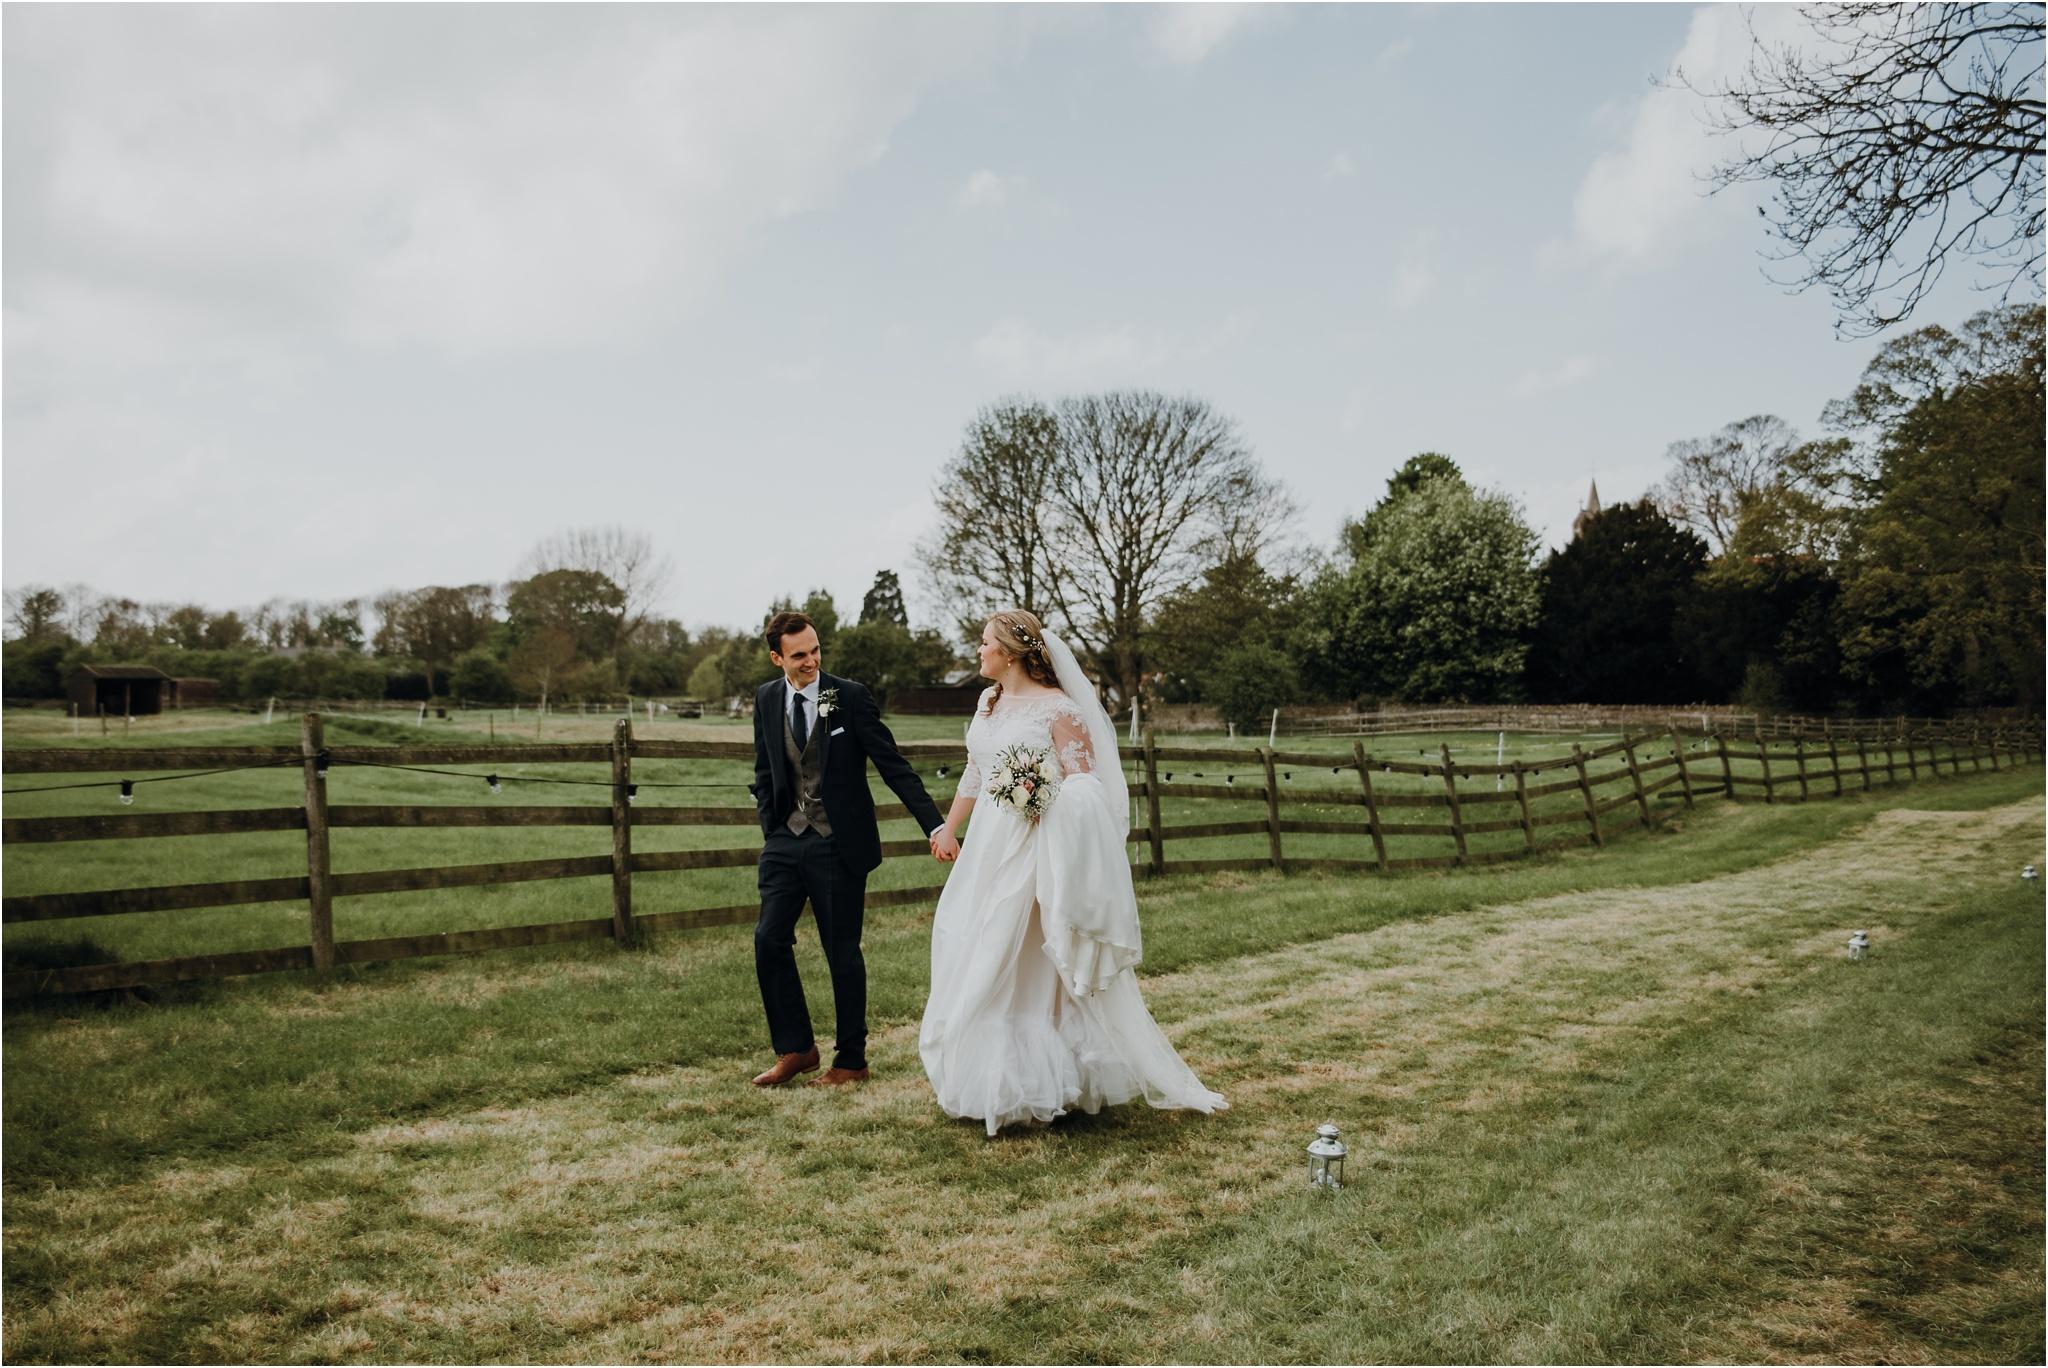 Outdoor-country-wedding-Edinburgh-photographer__0092.jpg